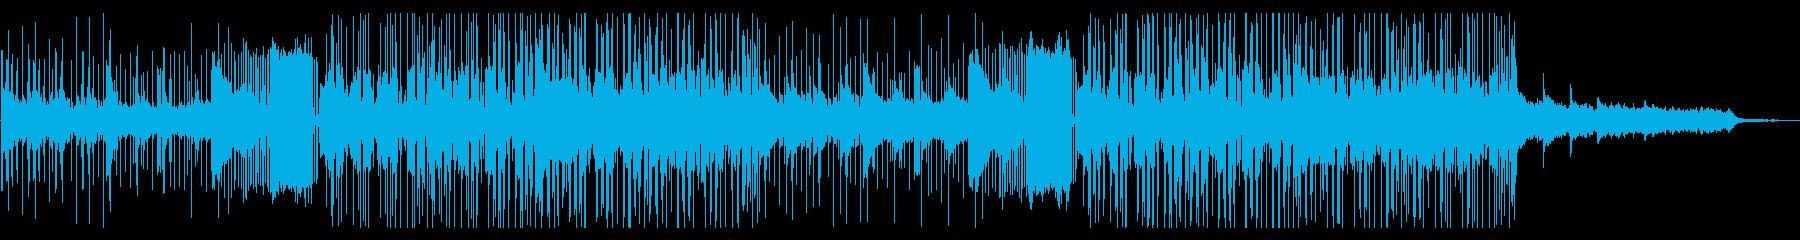 Kawaii Future Bassの再生済みの波形